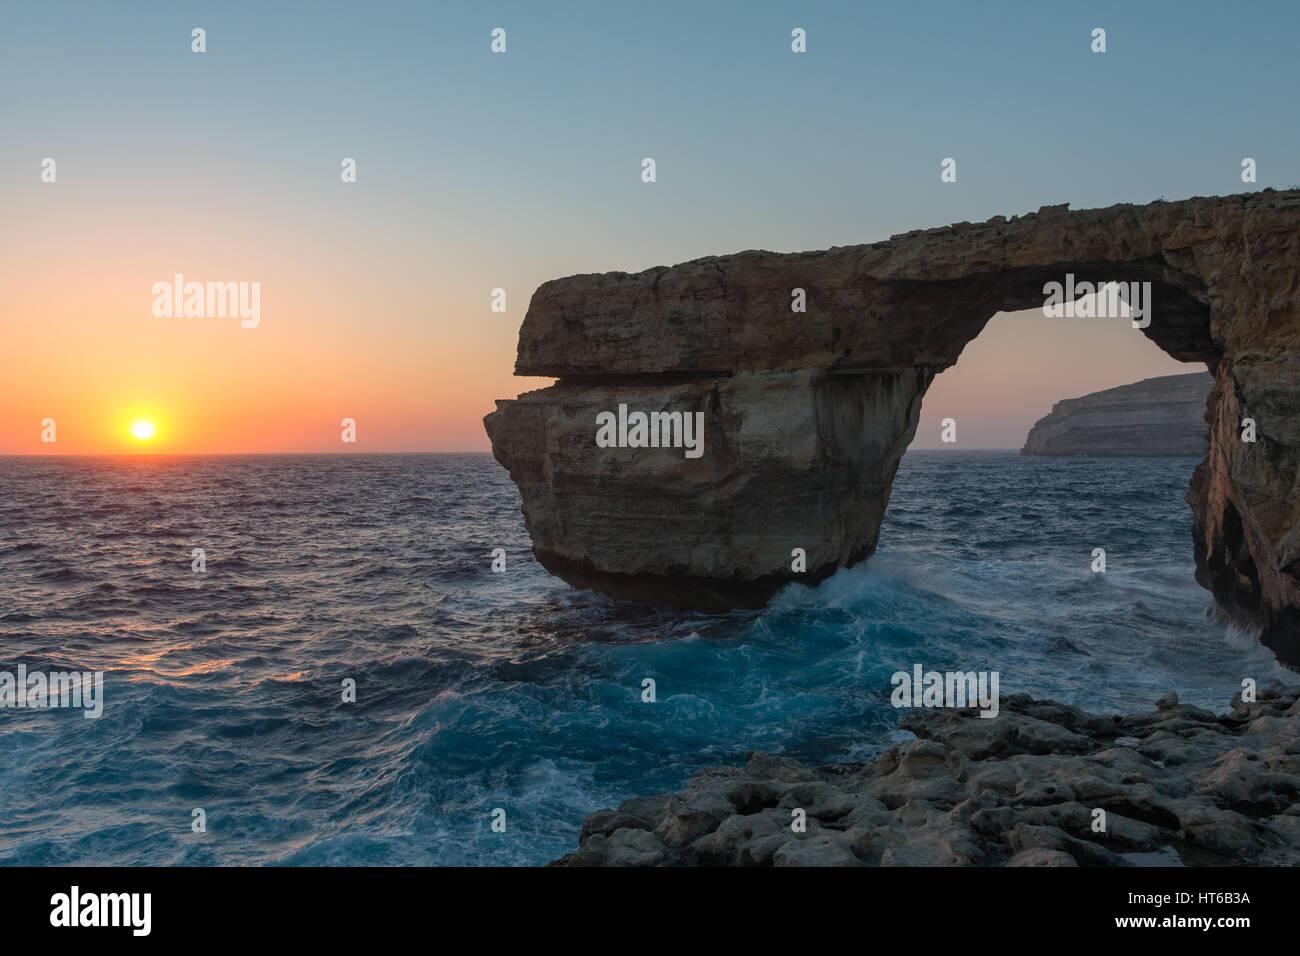 La ventana azul con olas al atardecer en Gozo, Malta Imagen De Stock